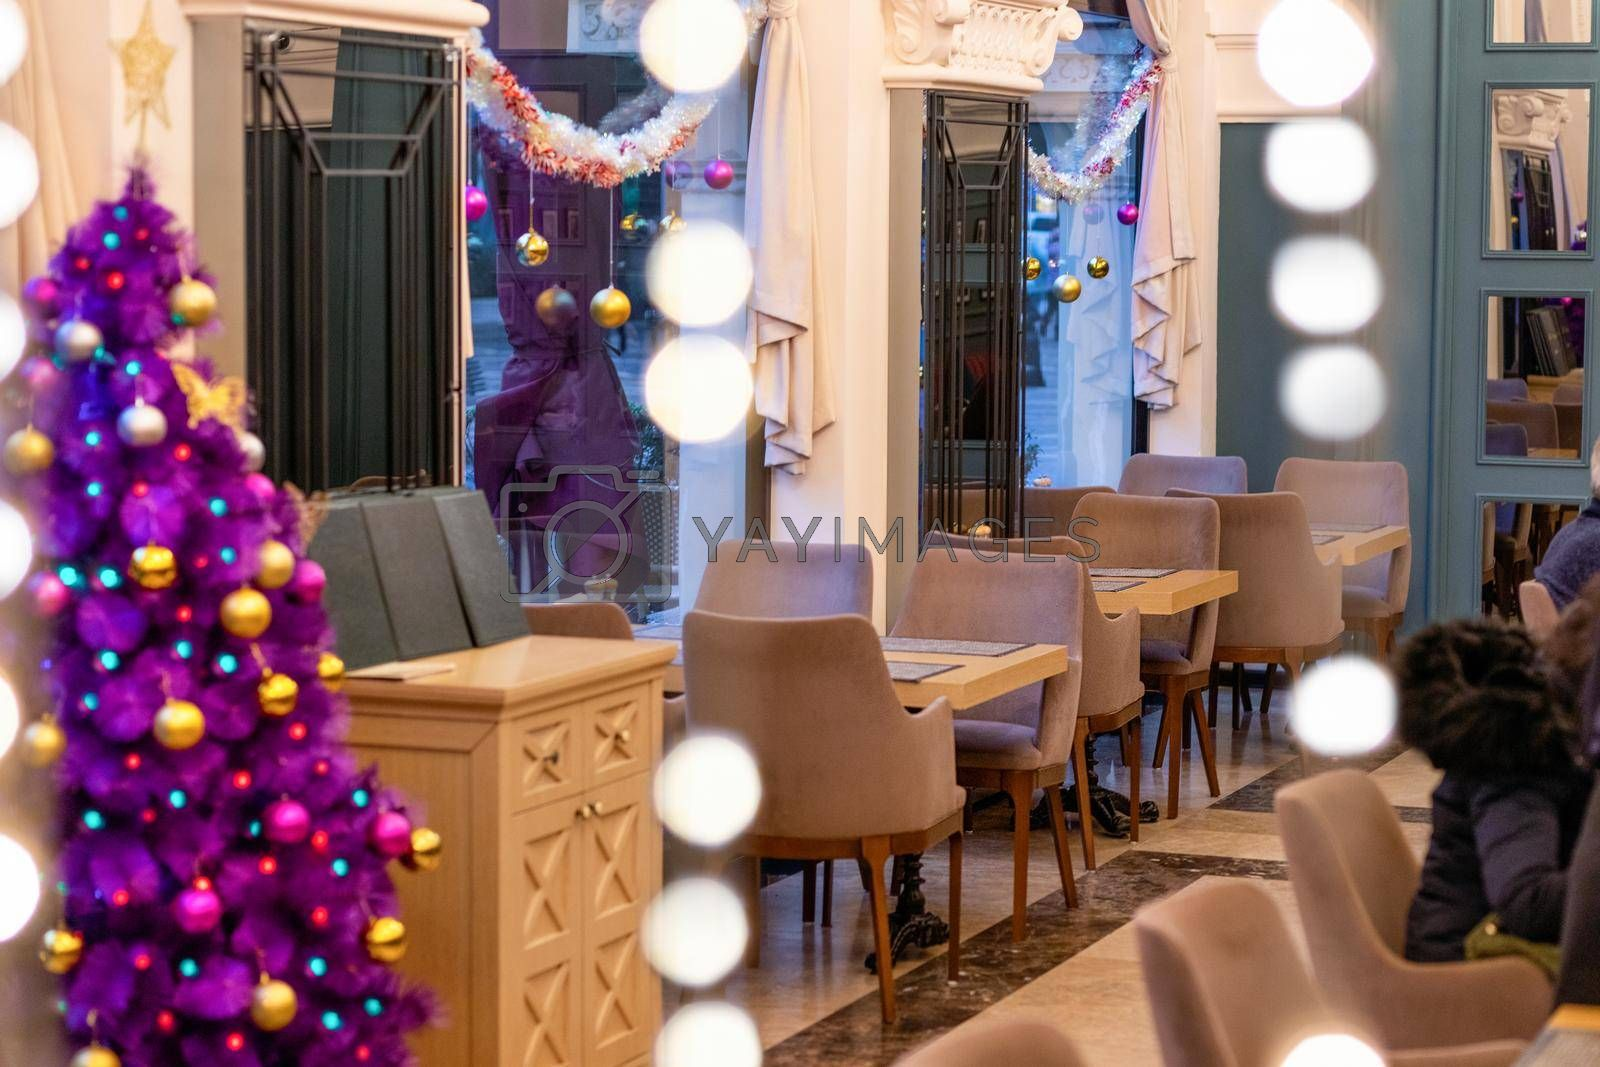 Purple Christmas tree in the restaurant interior